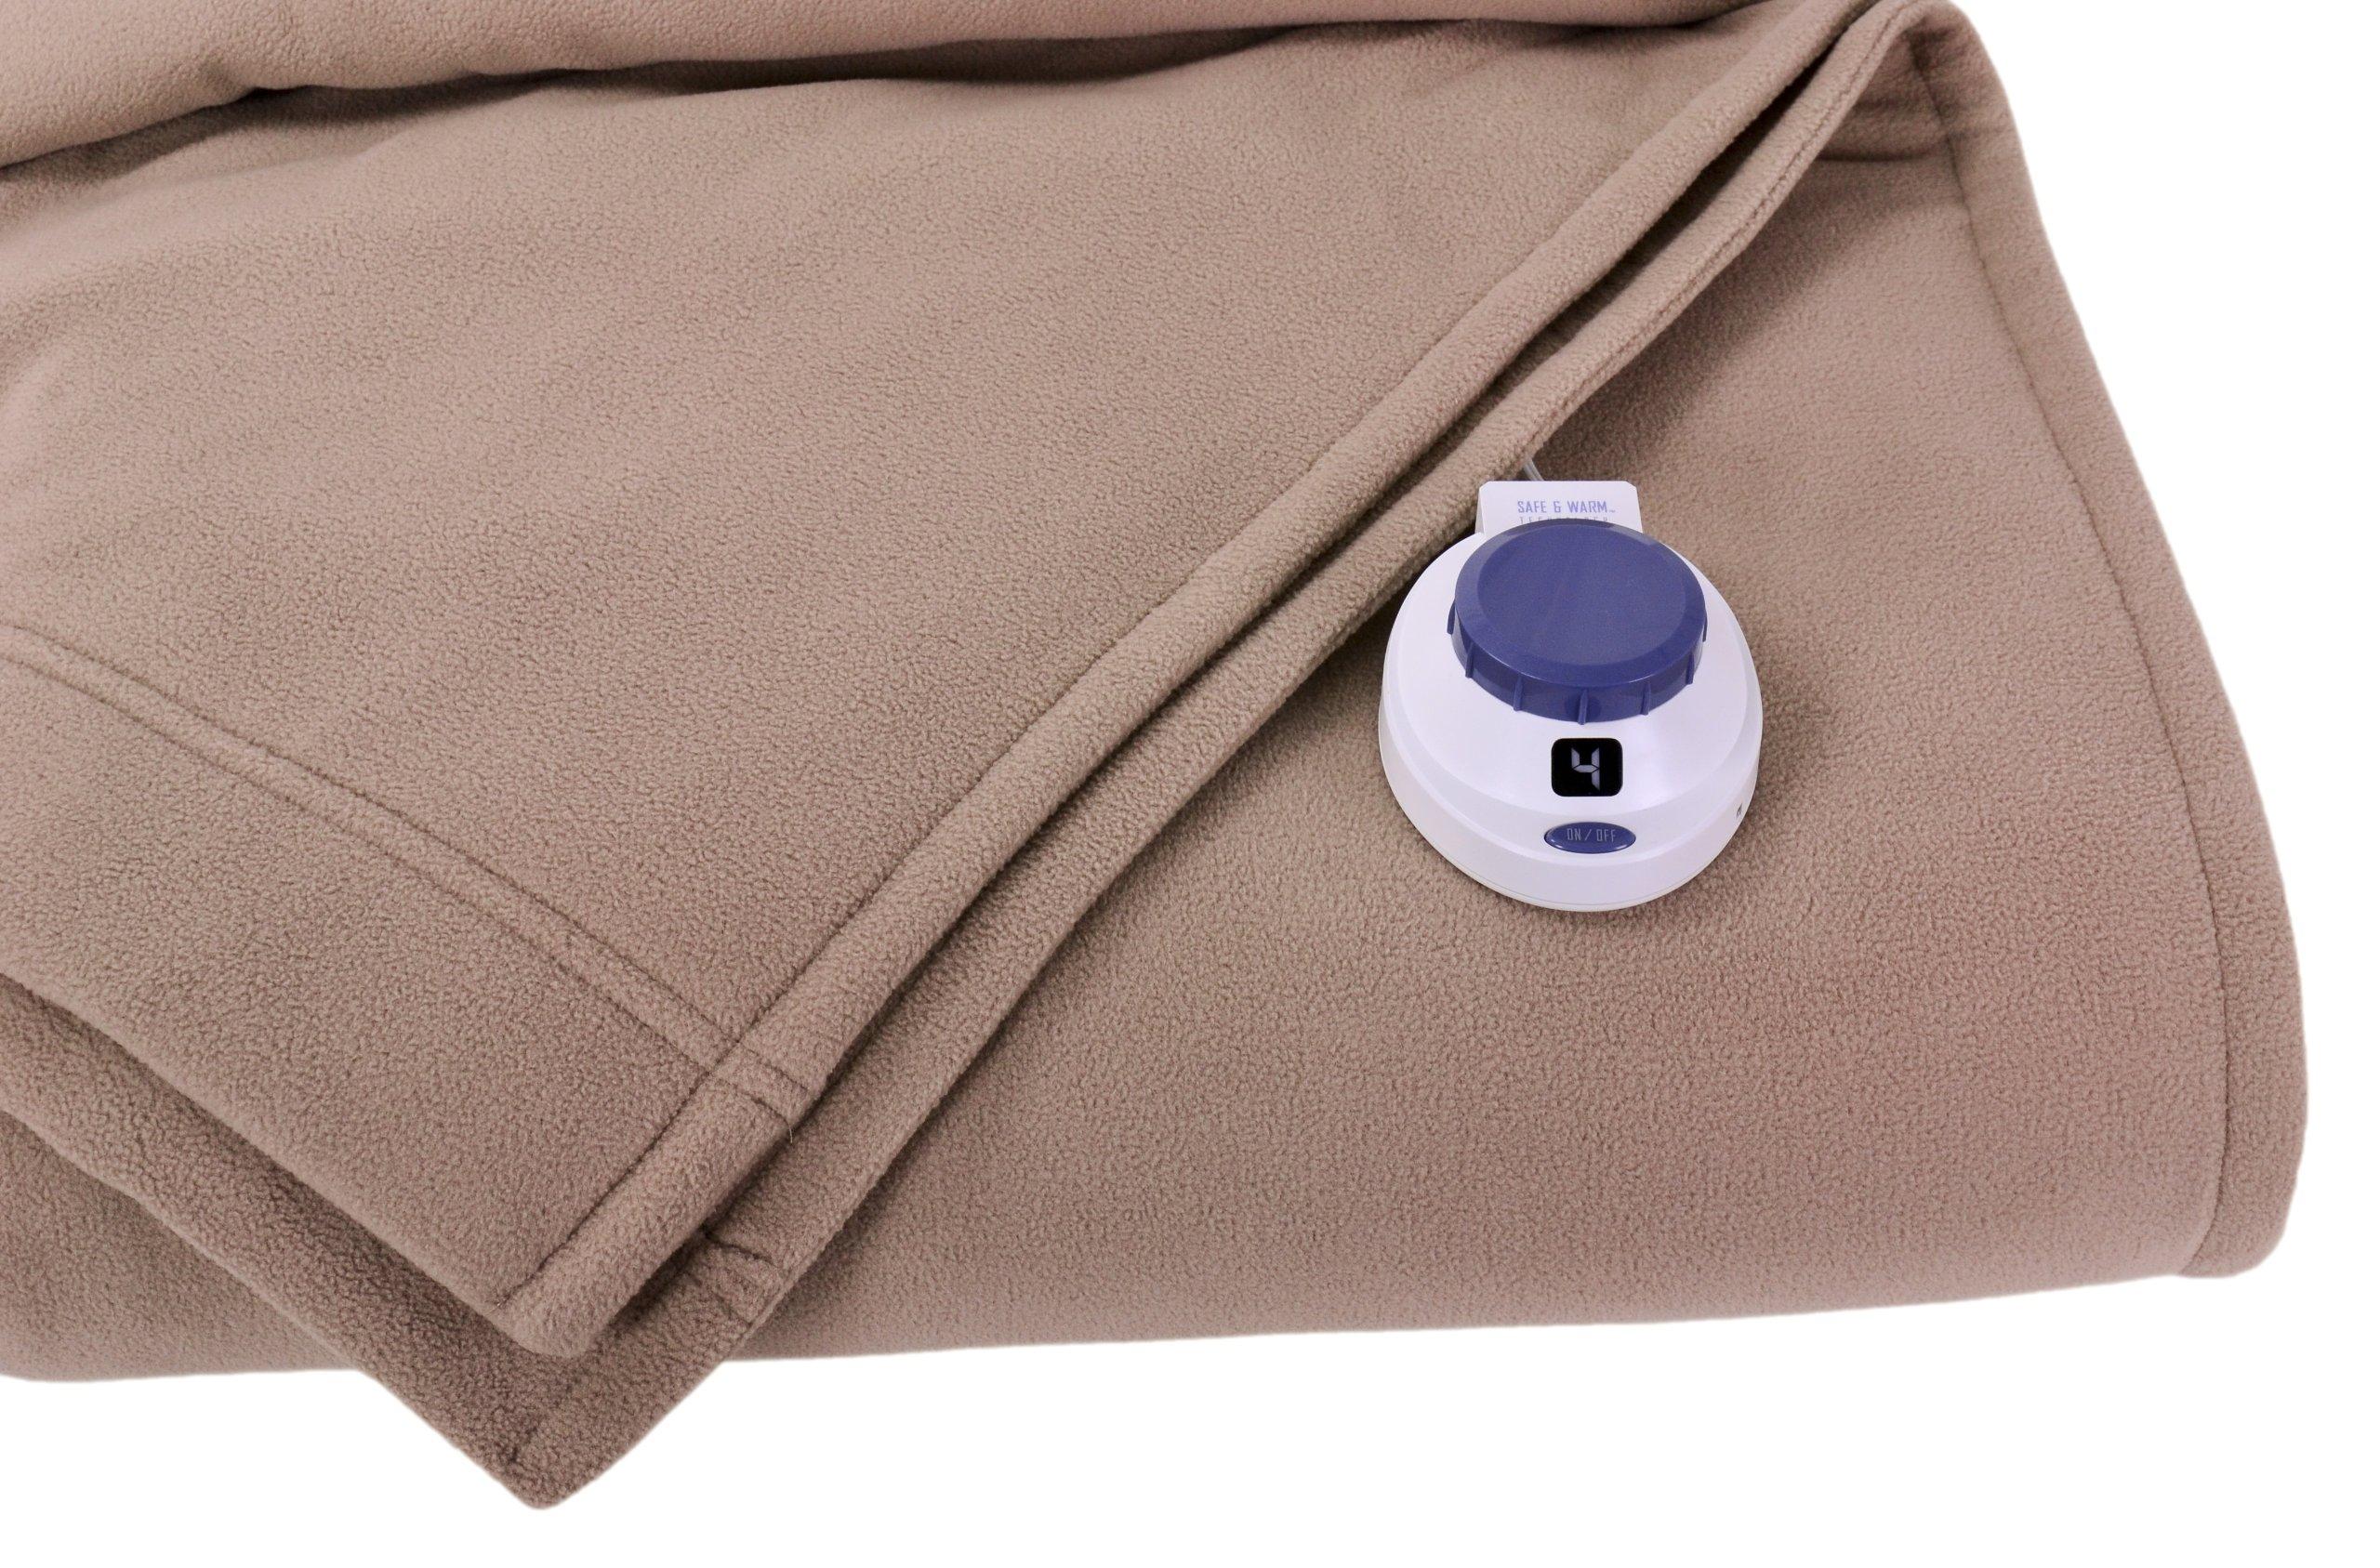 SoftHeat Luxury Micro-Fleece Low-Voltage Electric Heated Full Size Blanket, Beige